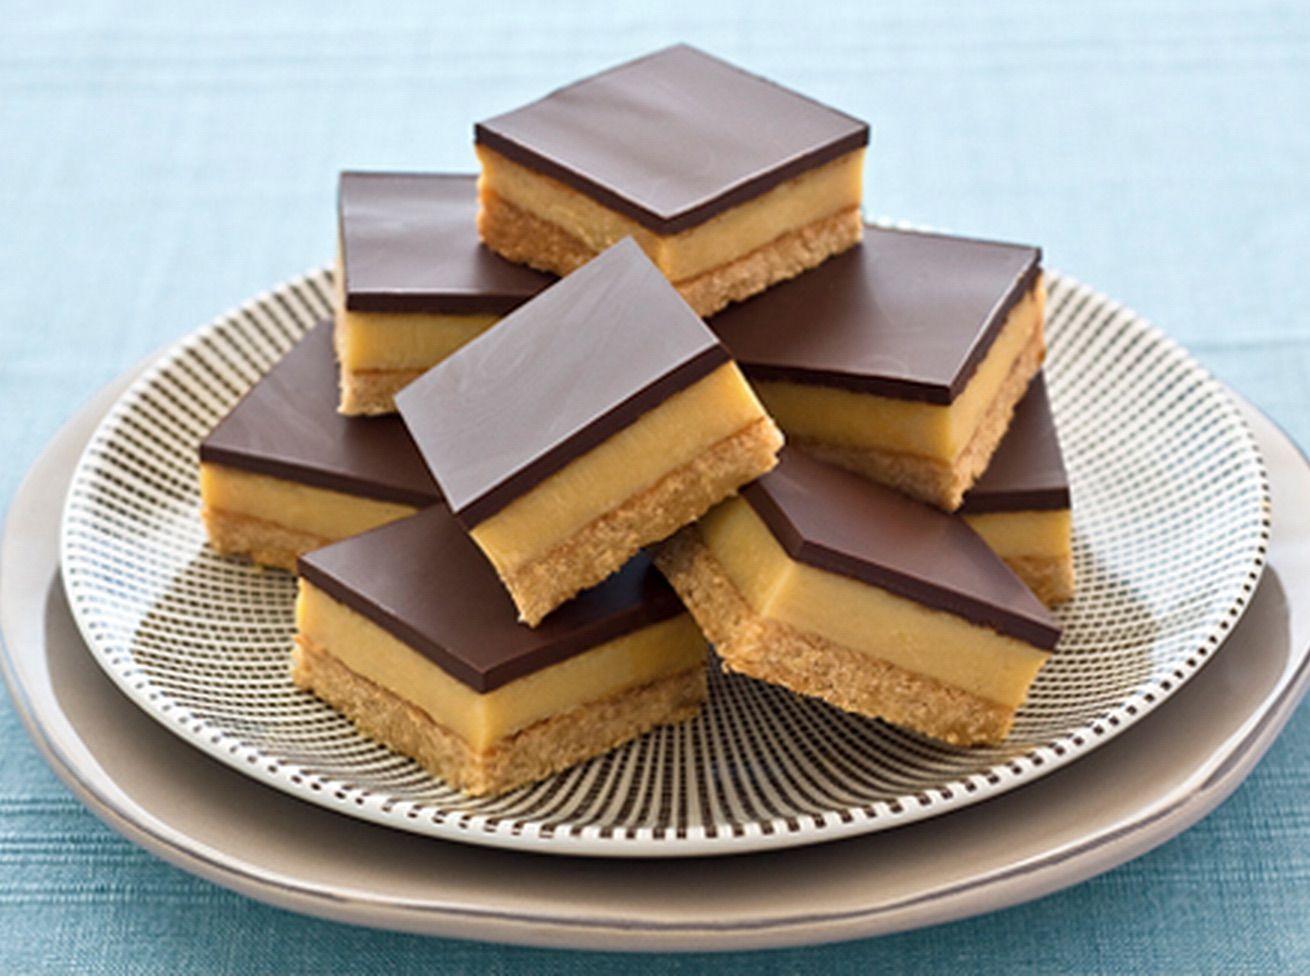 Chocolate Caramel Slice Recipe Video The Whoot Sweetened Condensed Milk Recipes Chocolate Caramel Slice Condensed Milk Recipes